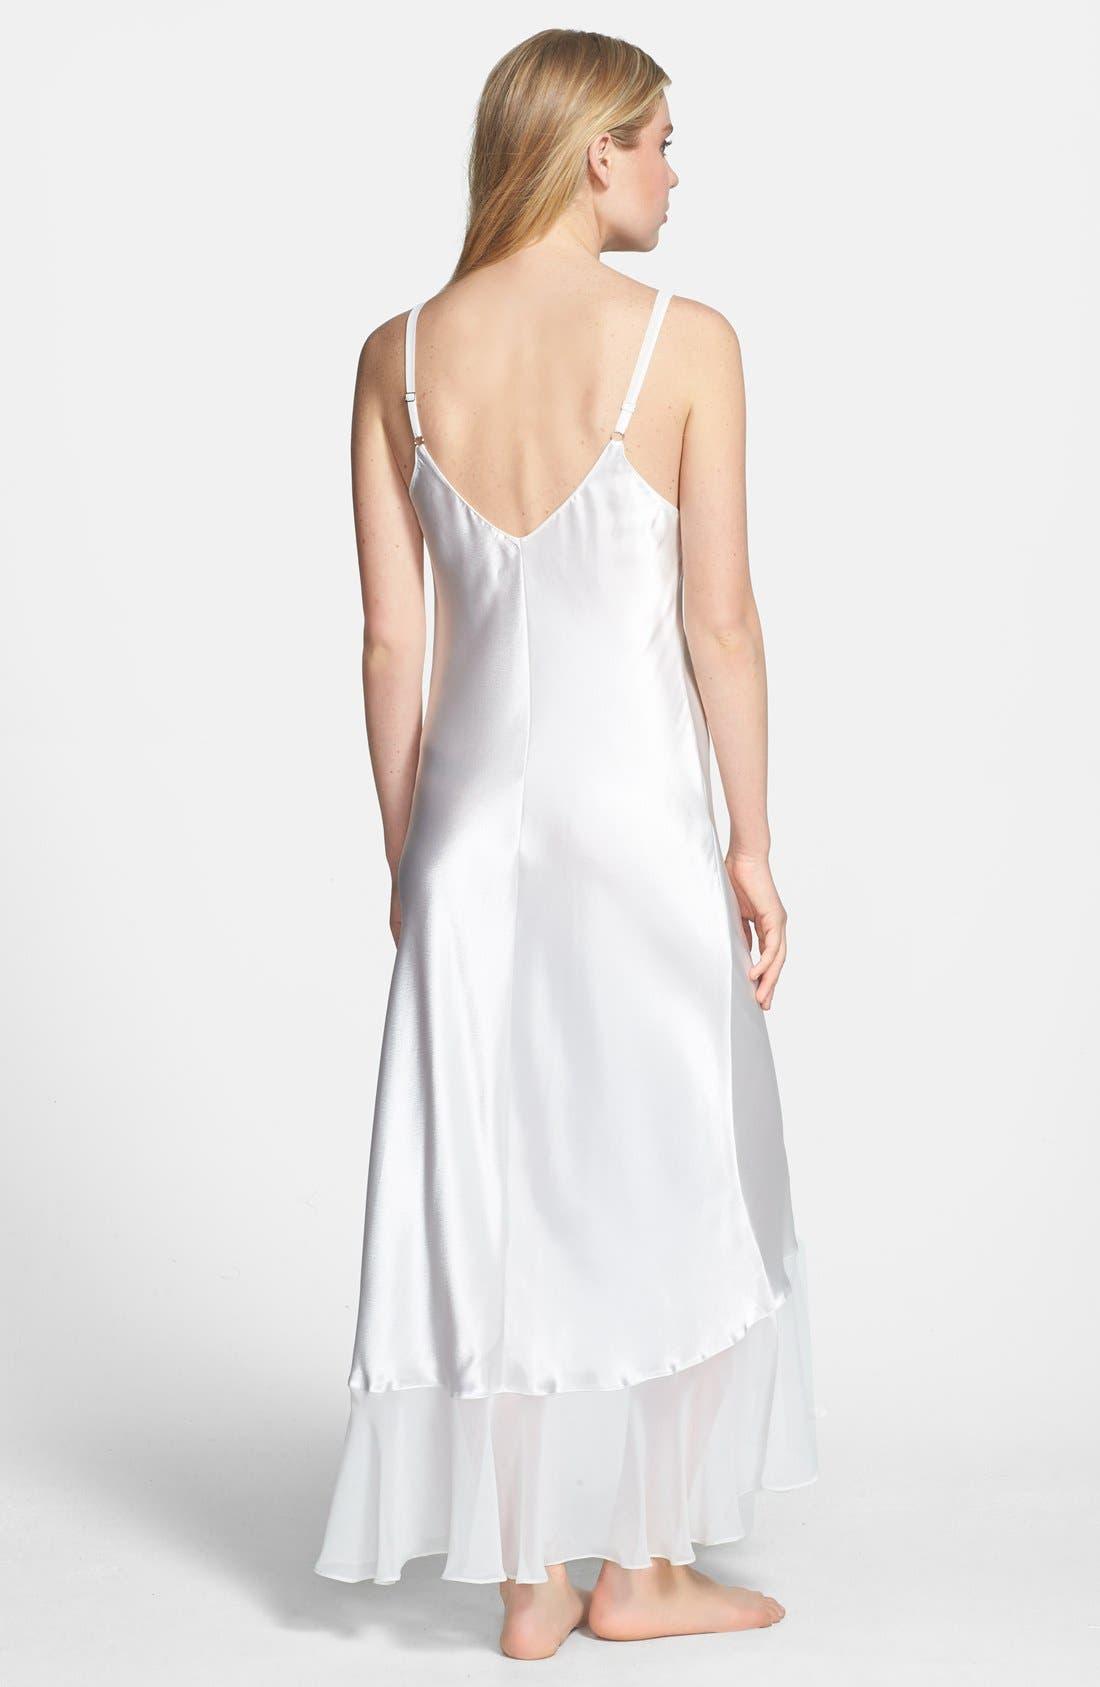 Alternate Image 2  - Oscar de la Renta Sleepwear 'Evening Bliss' Satin Charmeuse Nightgown